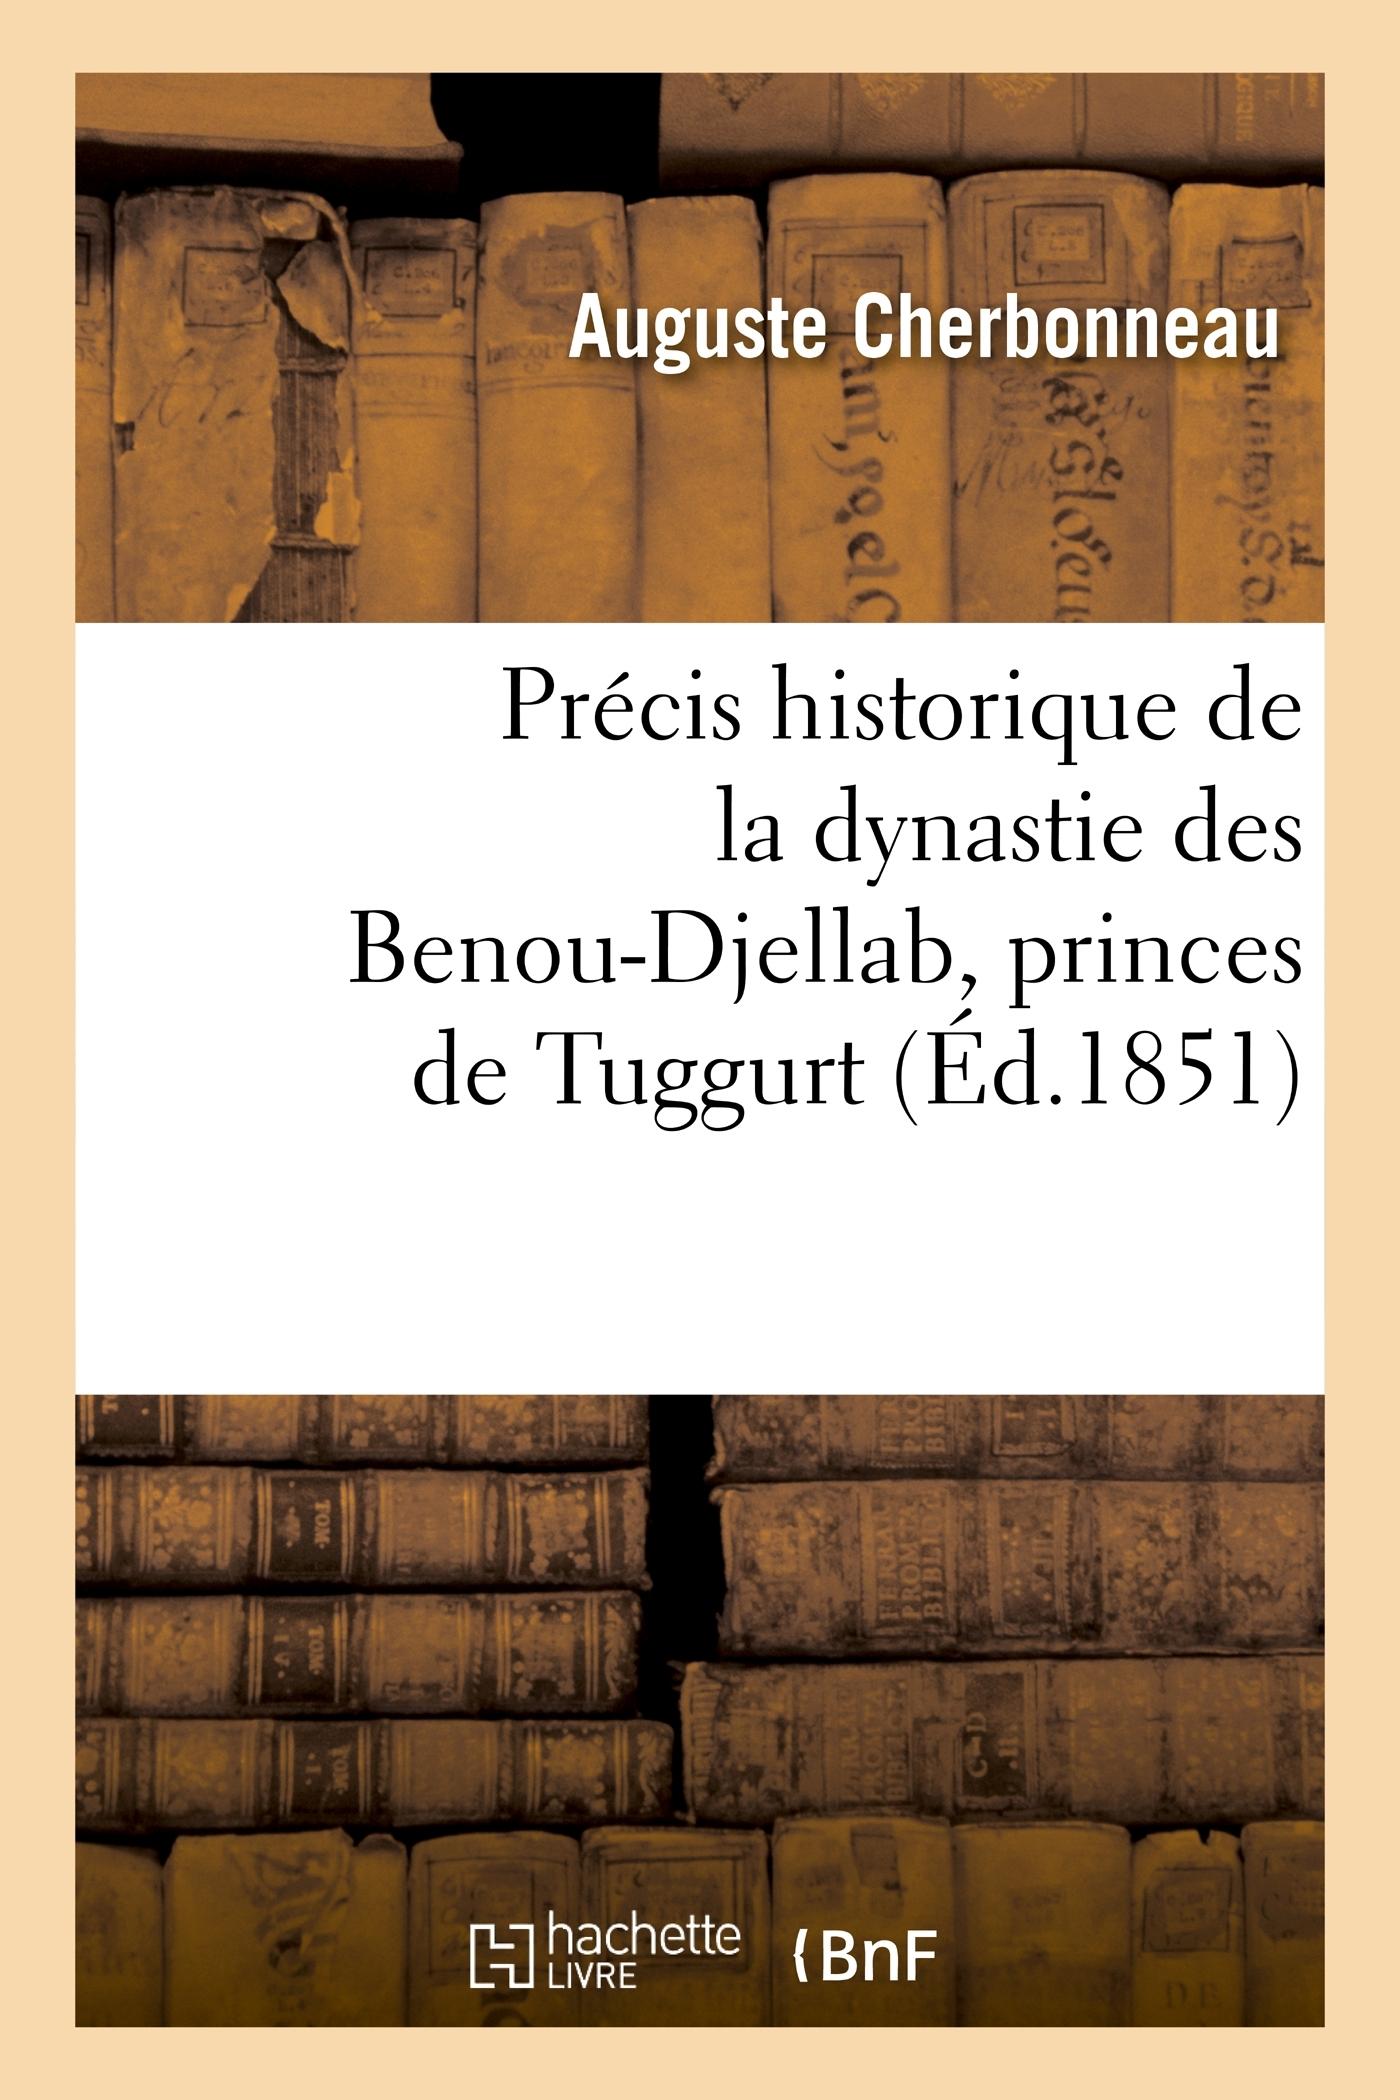 PRECIS HISTORIQUE DE LA DYNASTIE DES BENOU-DJELLAB, PRINCES DE TUGGURT